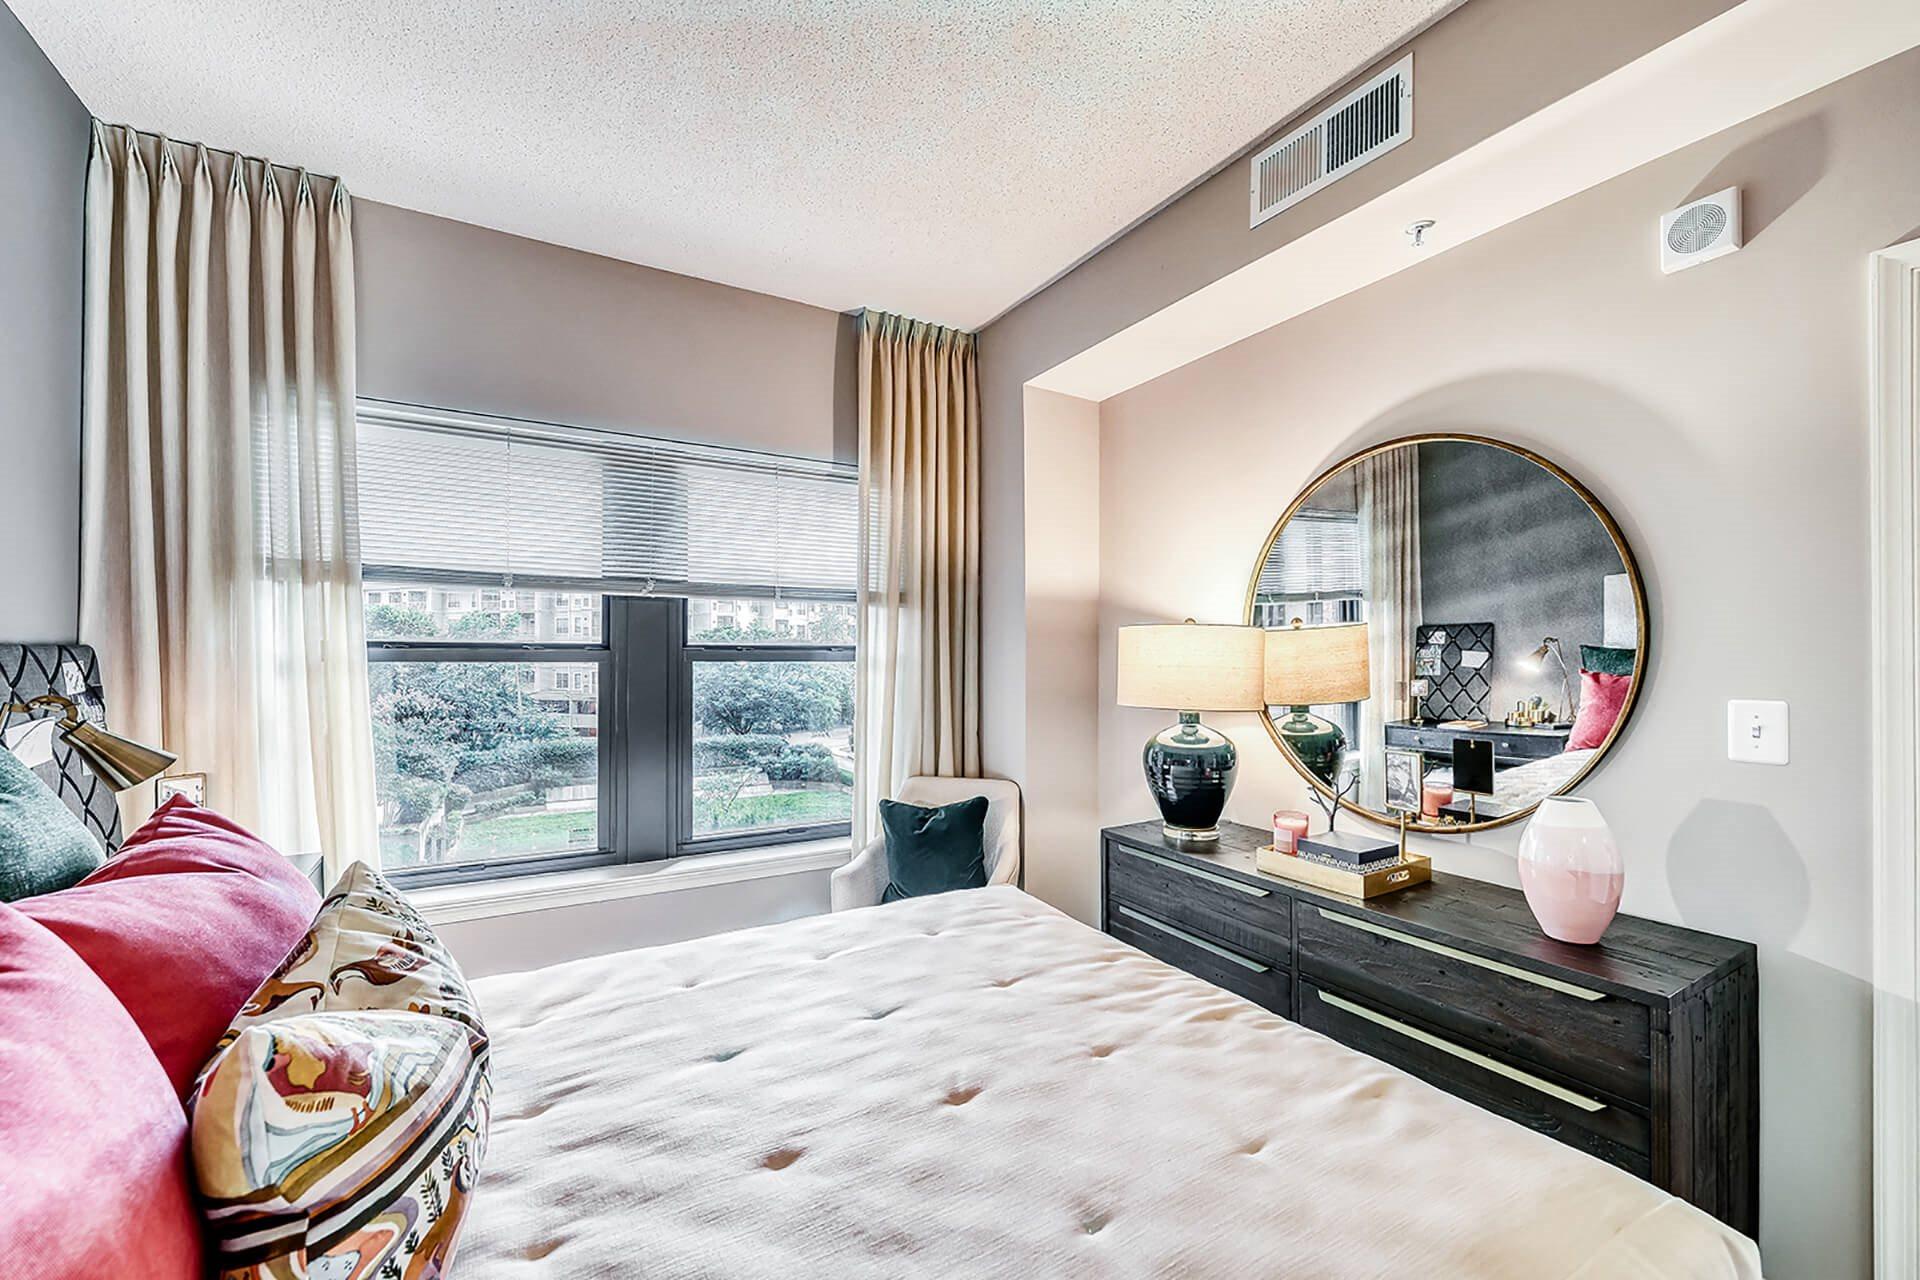 Bedrooms, at Halstead Tower by Windsor, Alexandria, Virginia